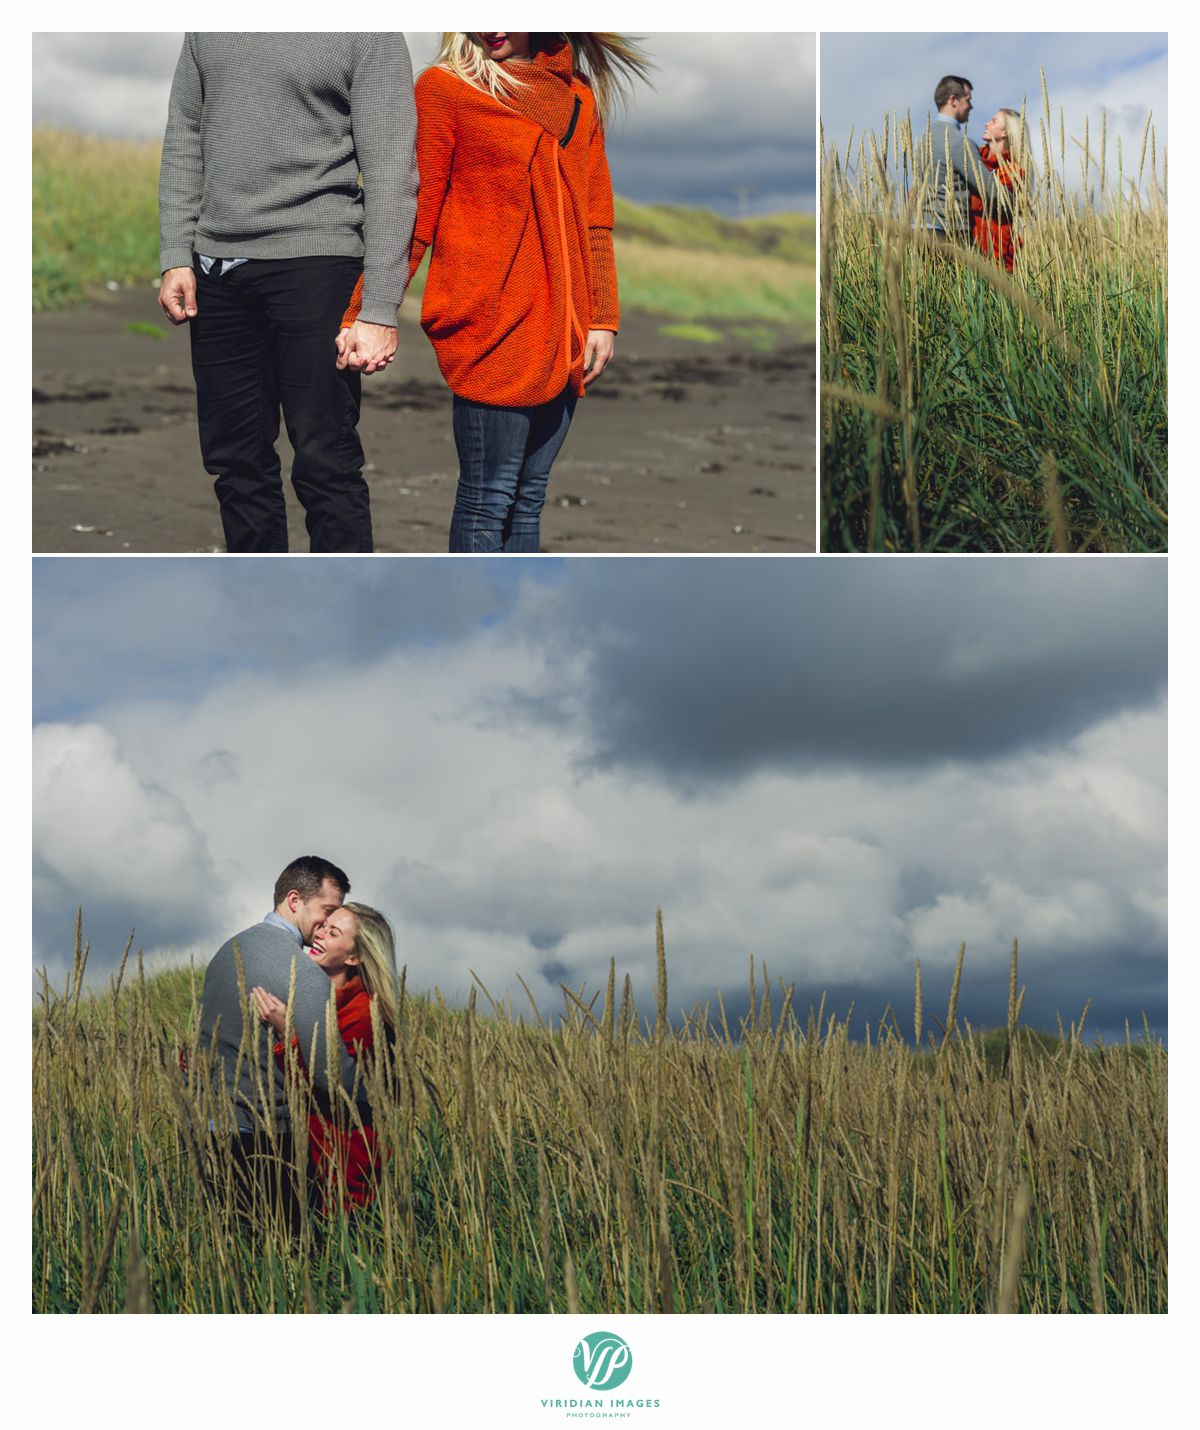 iceland-engagement-destination-black-sand-beach-viridian-images-photography-18